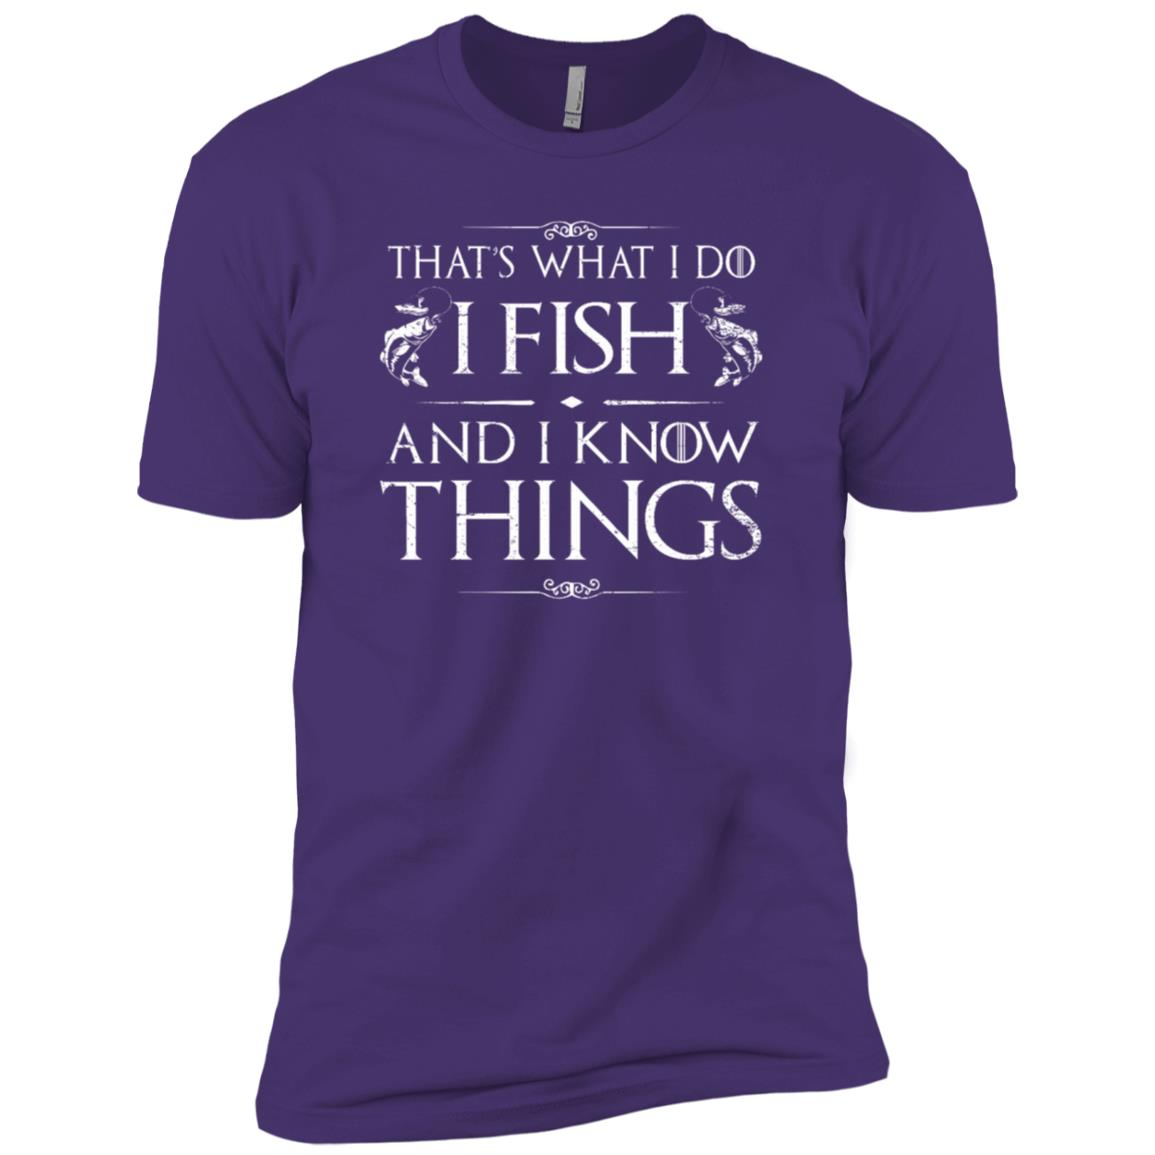 I Fish and I Know Things, Funny Fishing Fisherman Gift Men Short Sleeve T-Shirt